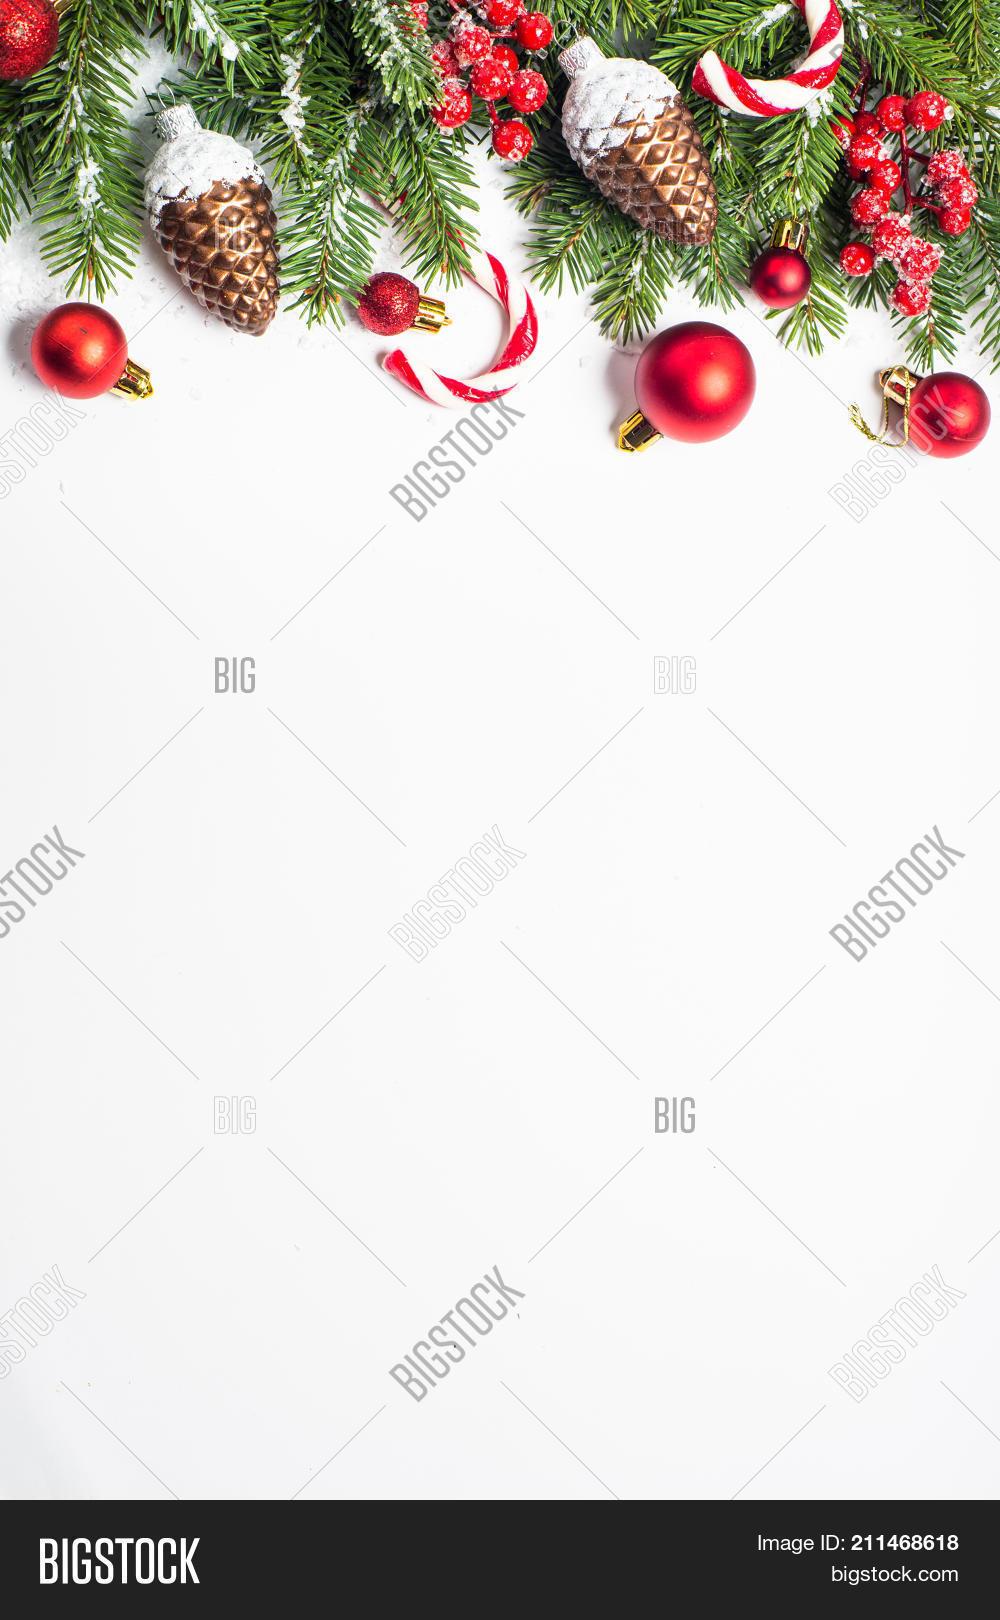 christmas background image photo free trial bigstock